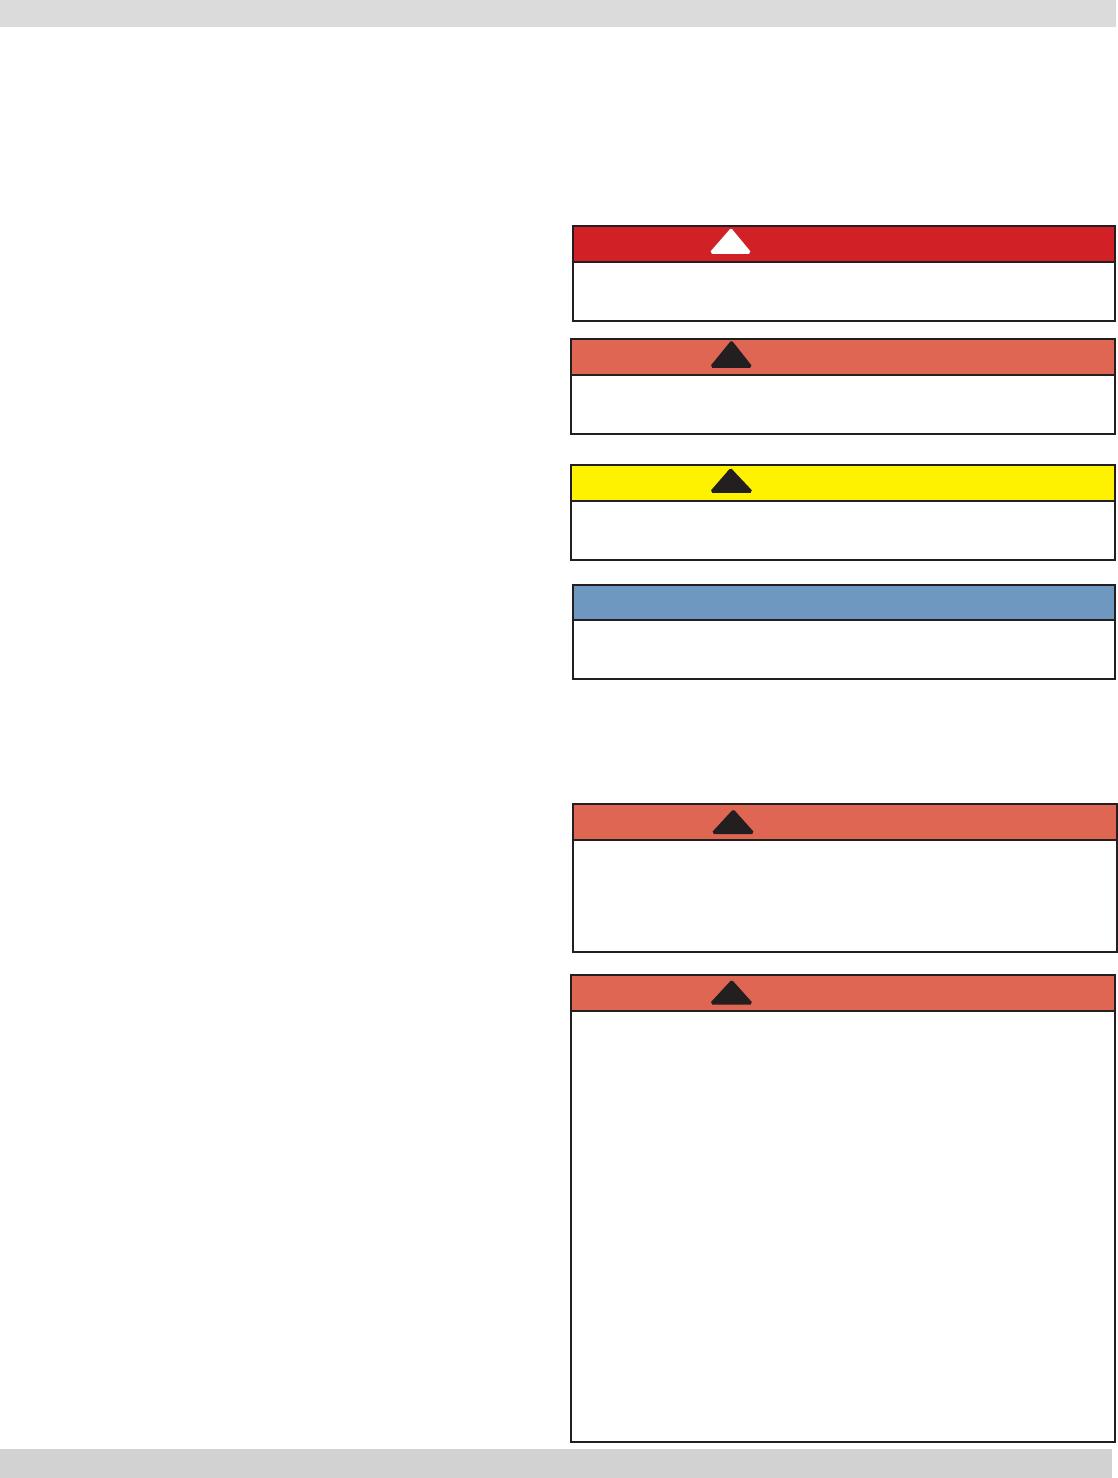 Utica Boilers Svb Series Ii Operation And Installation Manual Wiring Diagram 2